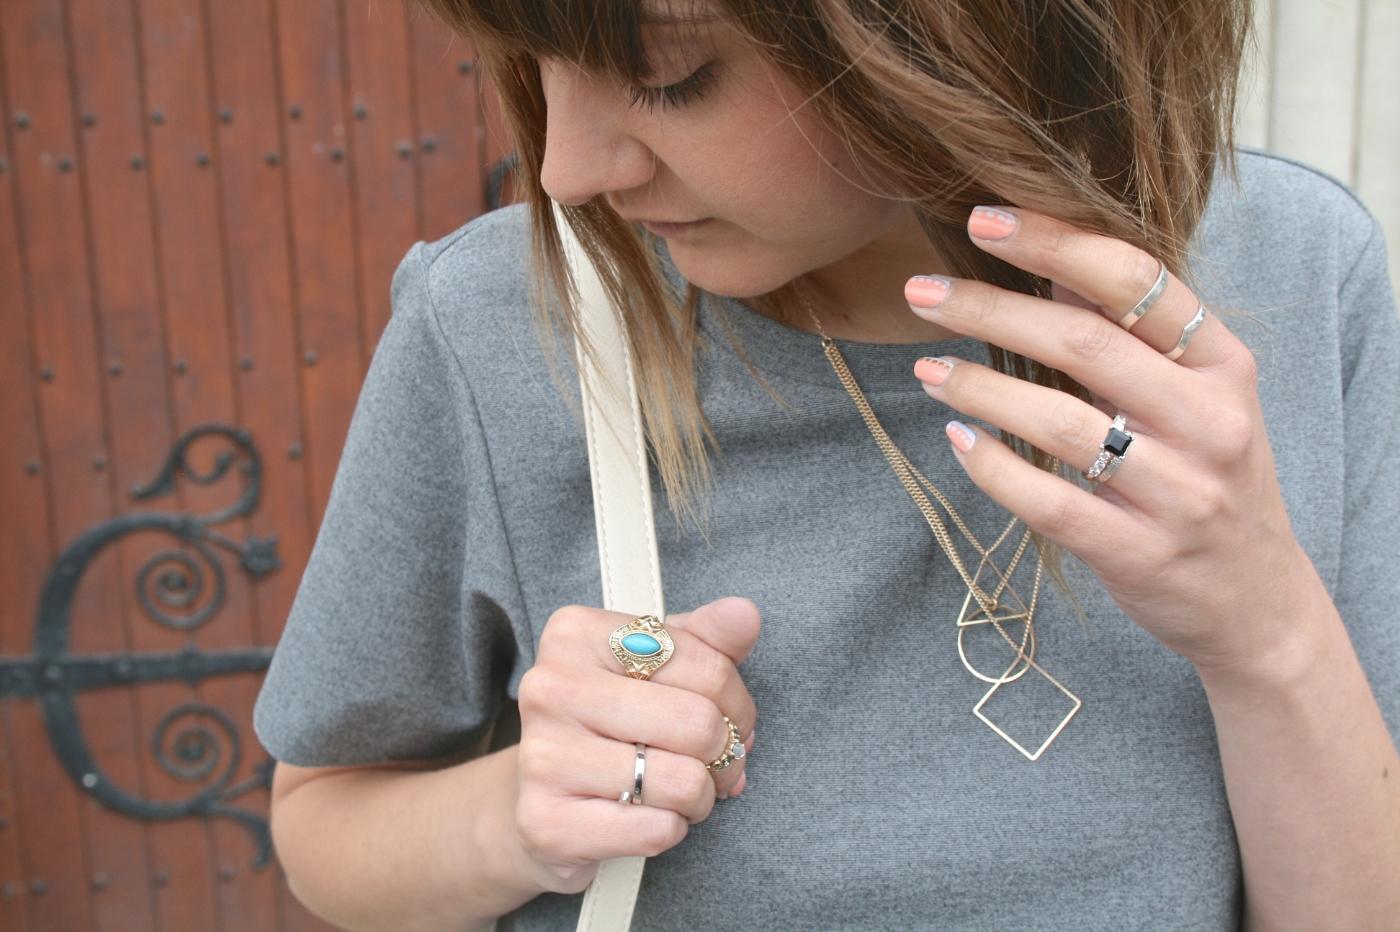 primark jewellery